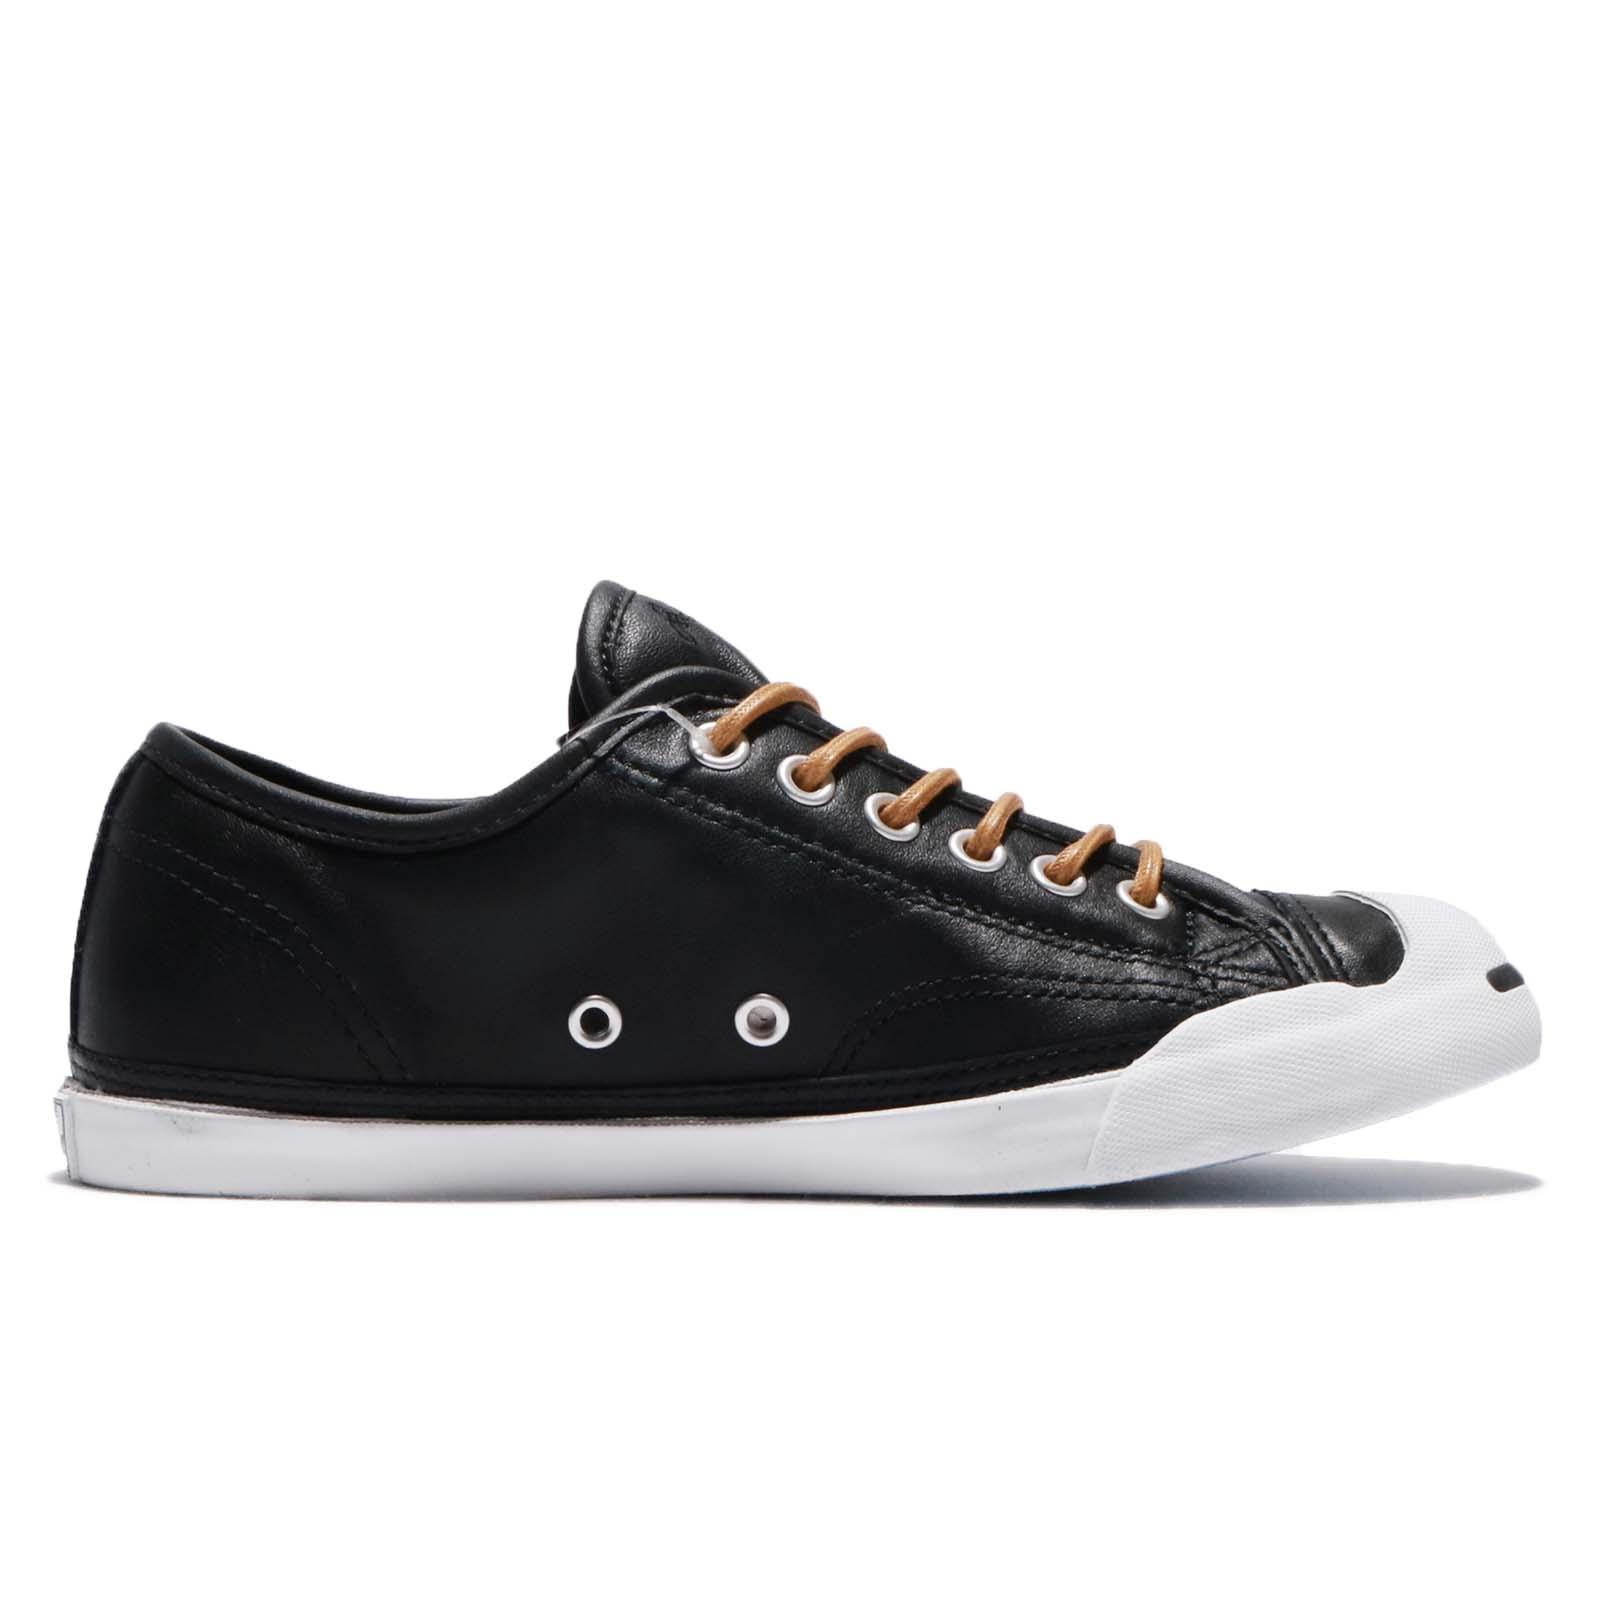 963f50351512 Converse Jack Purcell LP L S Leather Black Brown White Men Shoes ...